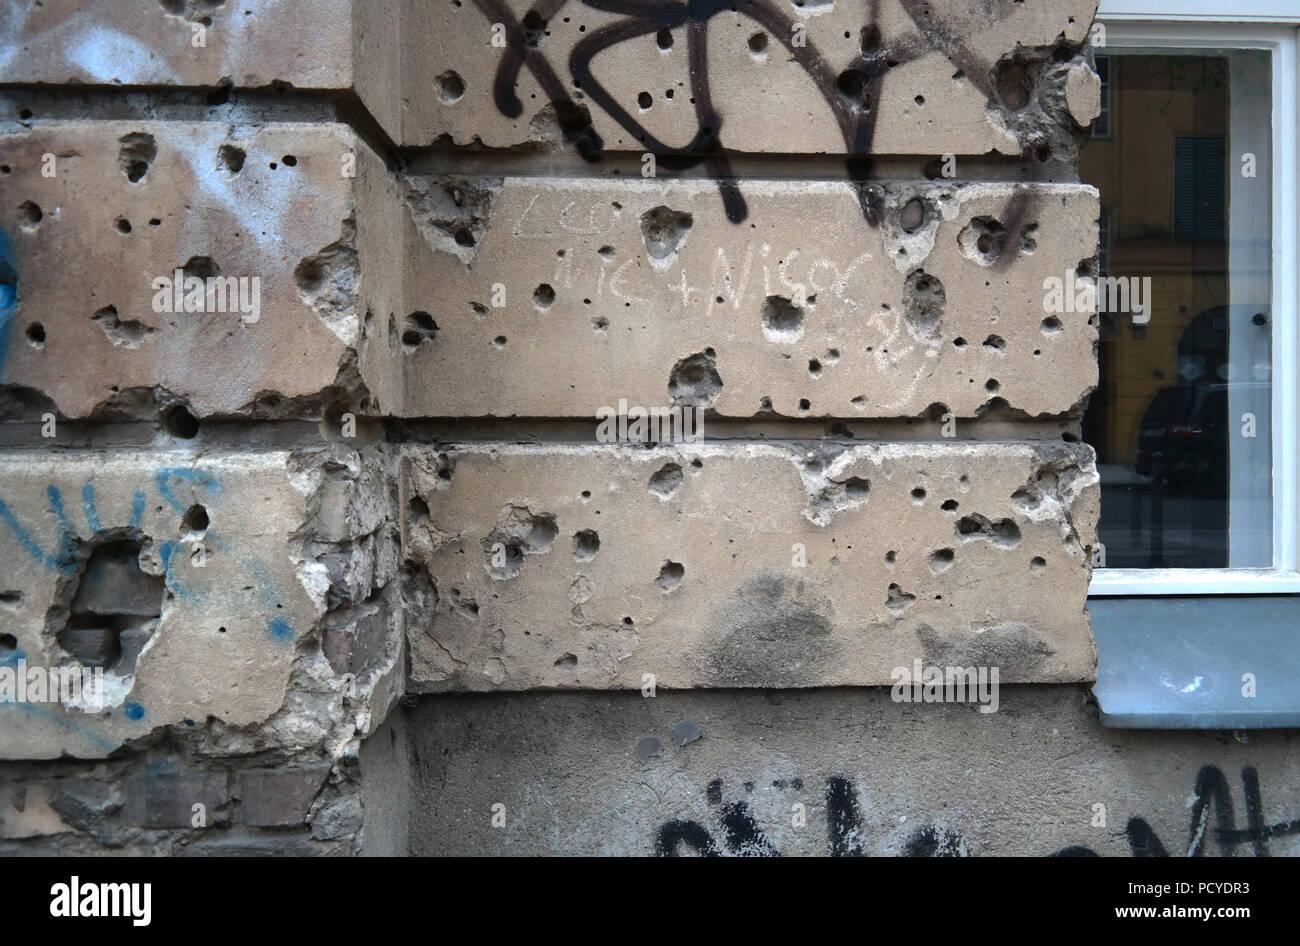 Berlin, Mitte, Große Hamburger Str Krieg Bombe Granat Löcher - Stock Image